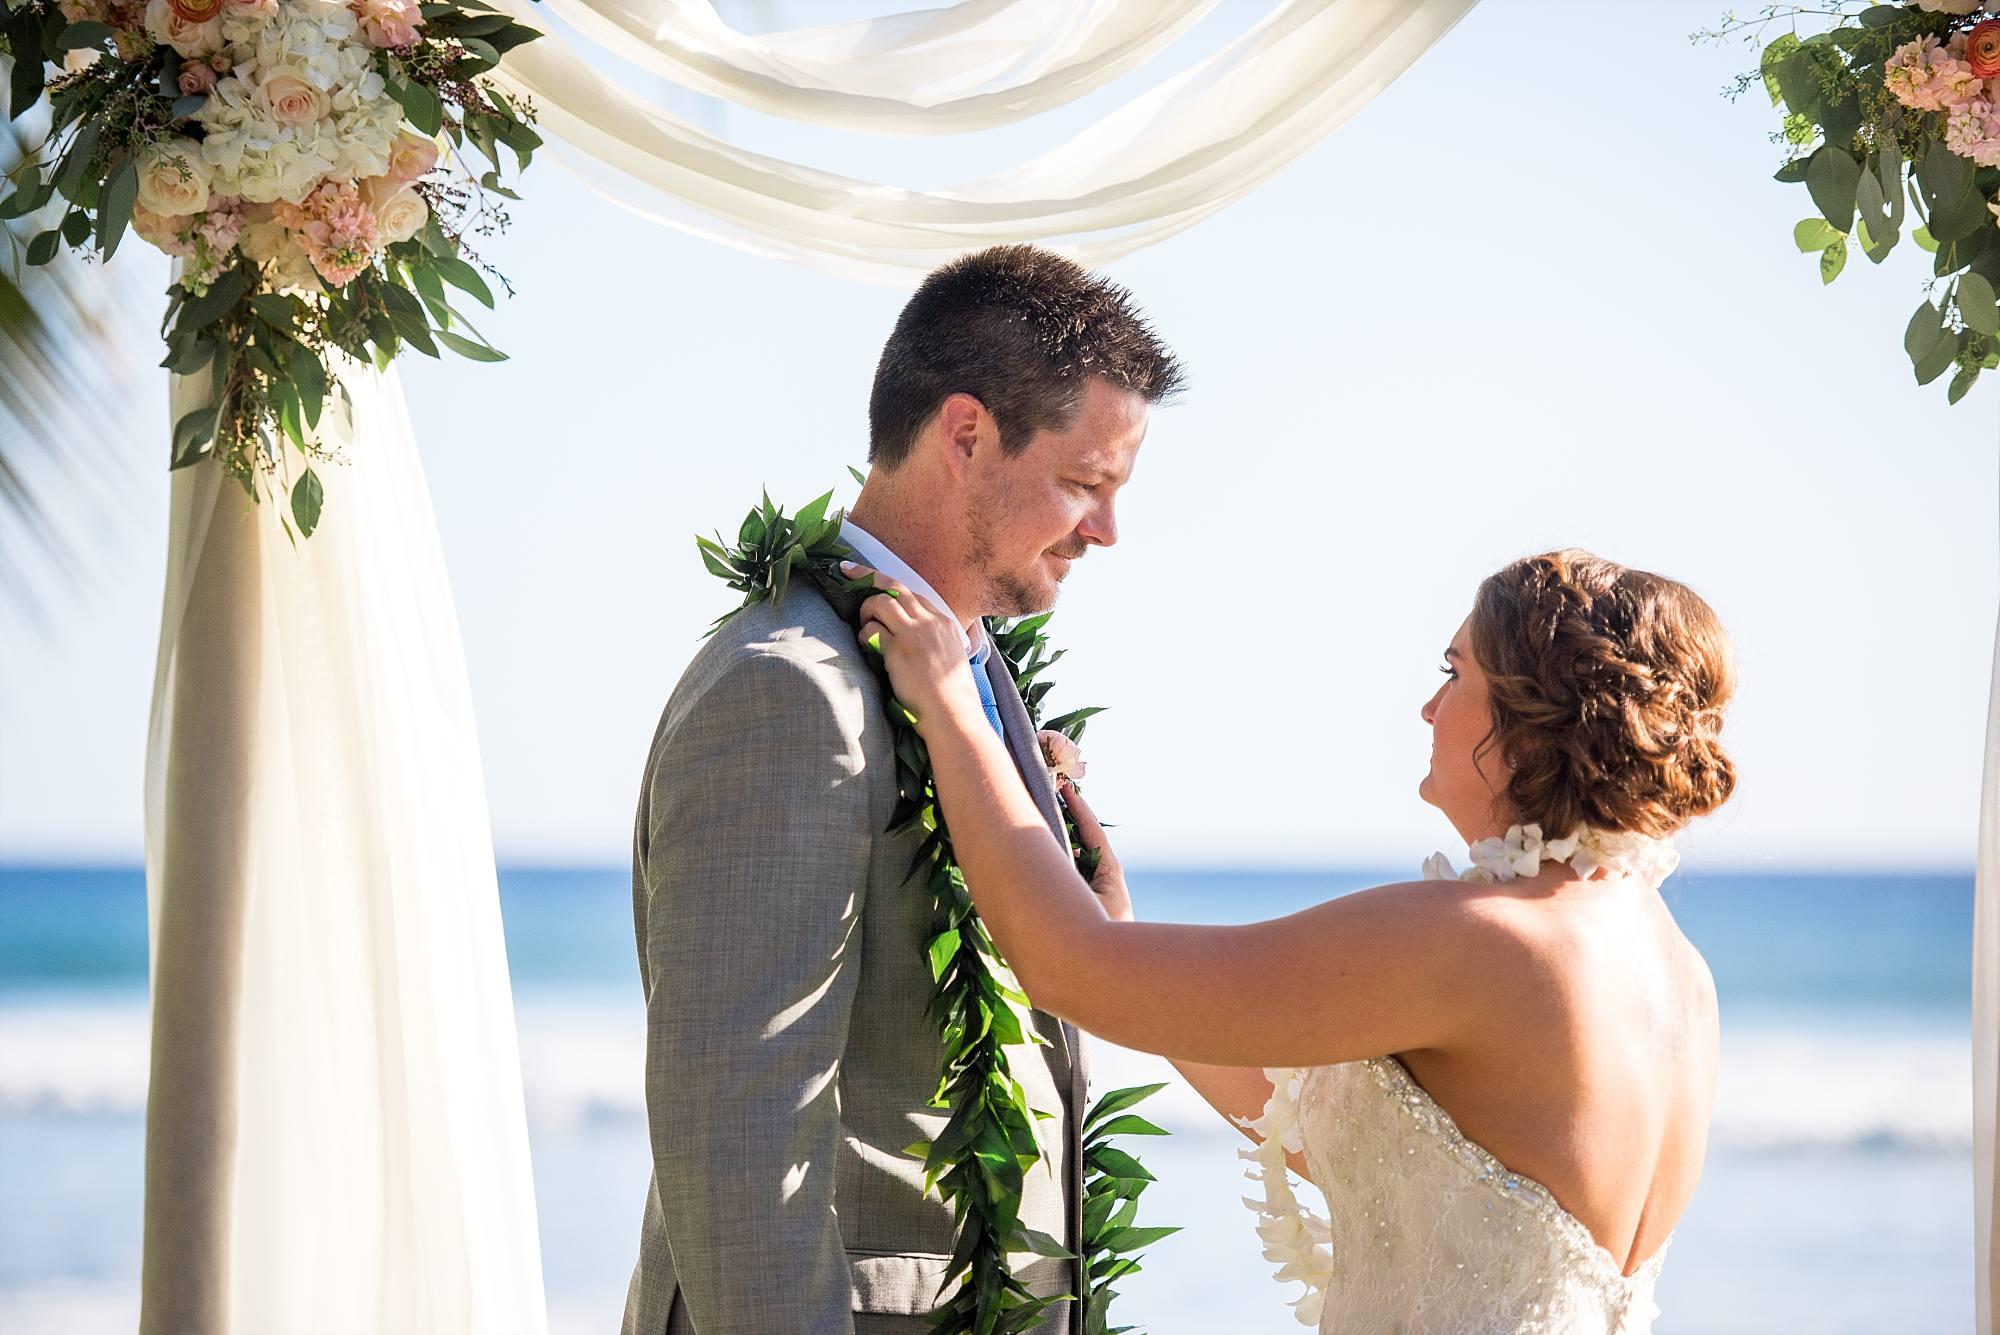 couple exchanging leis at their wedding